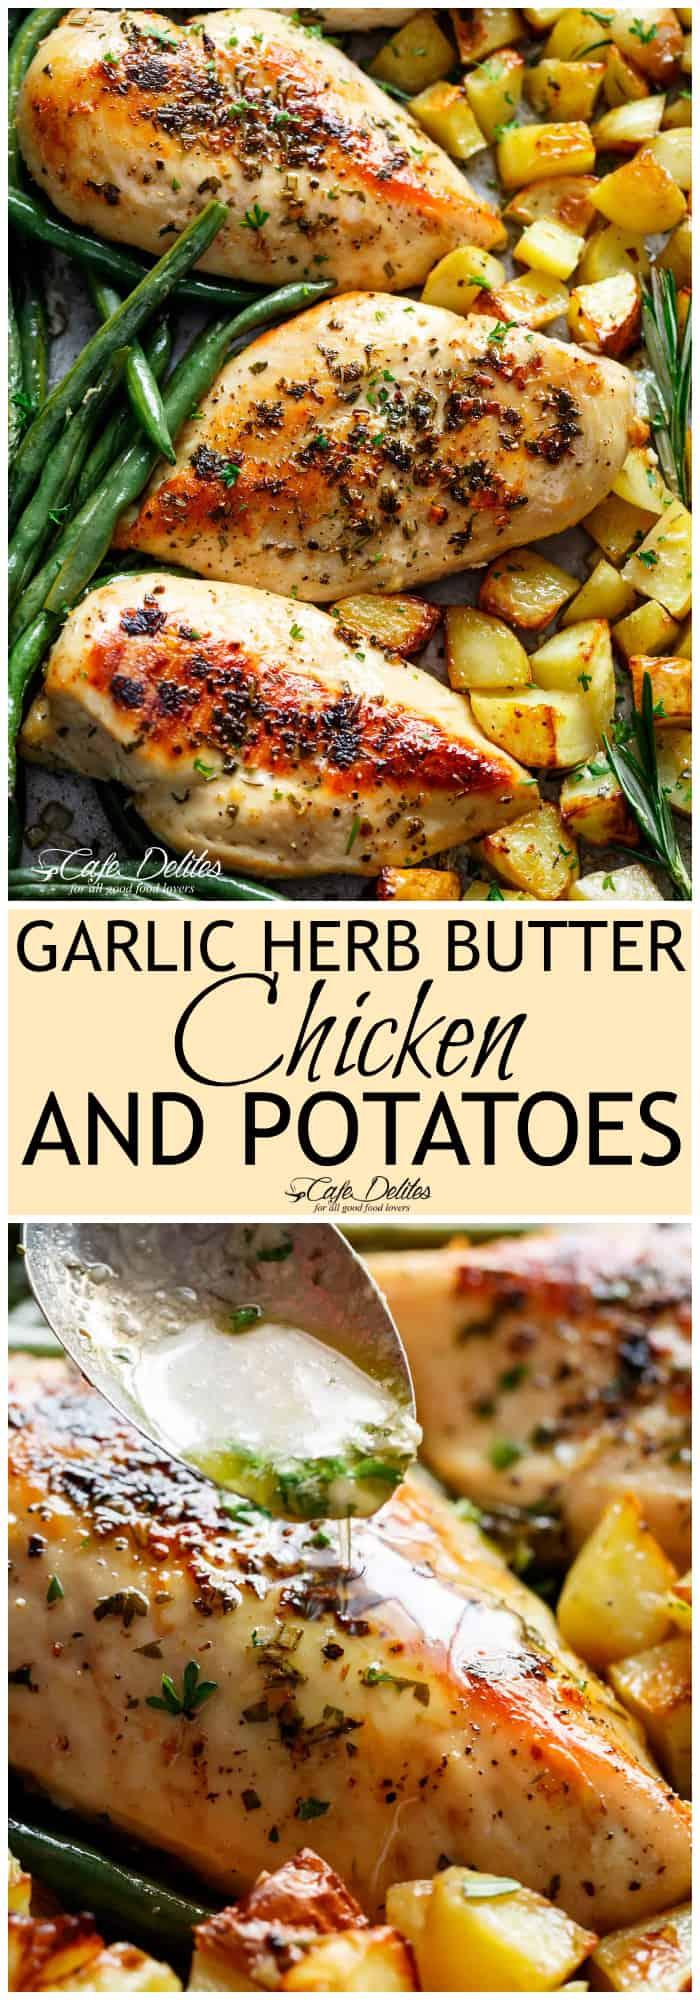 Sheet Pan Garlic Herb Butter Chicken & Potatoes - Cafe Delites